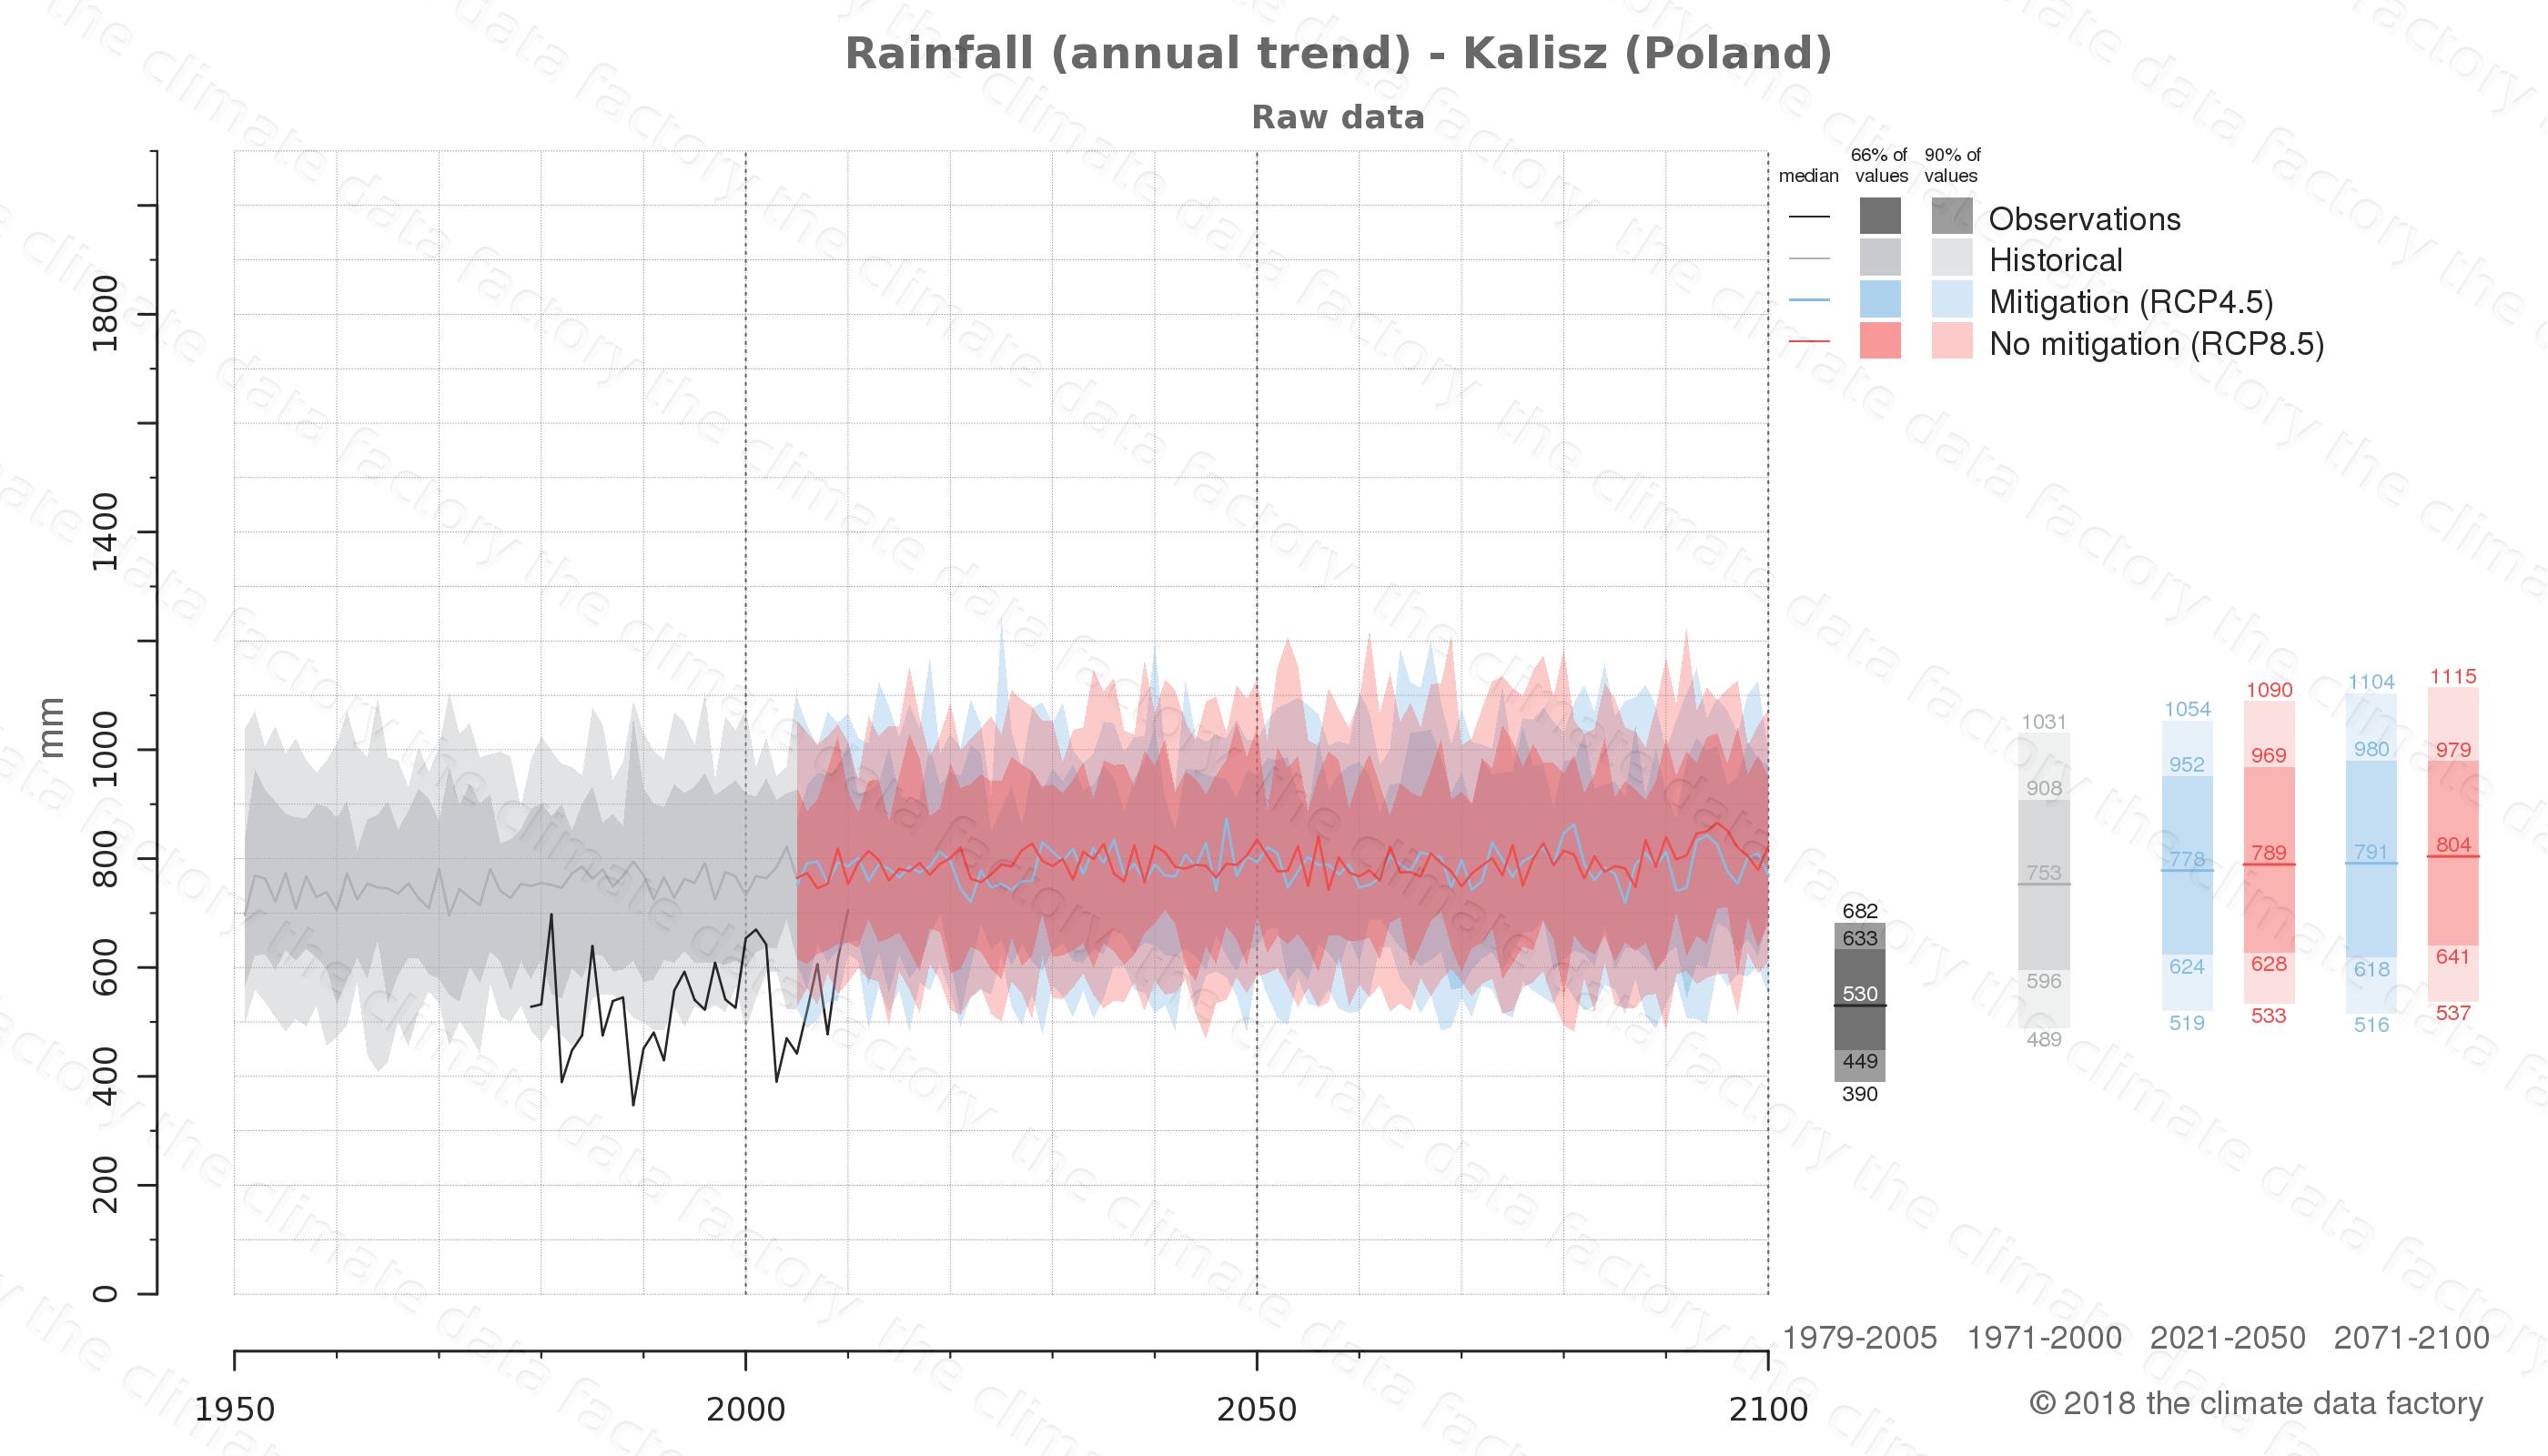 climate change data policy adaptation climate graph city data rainfall kalisz poland